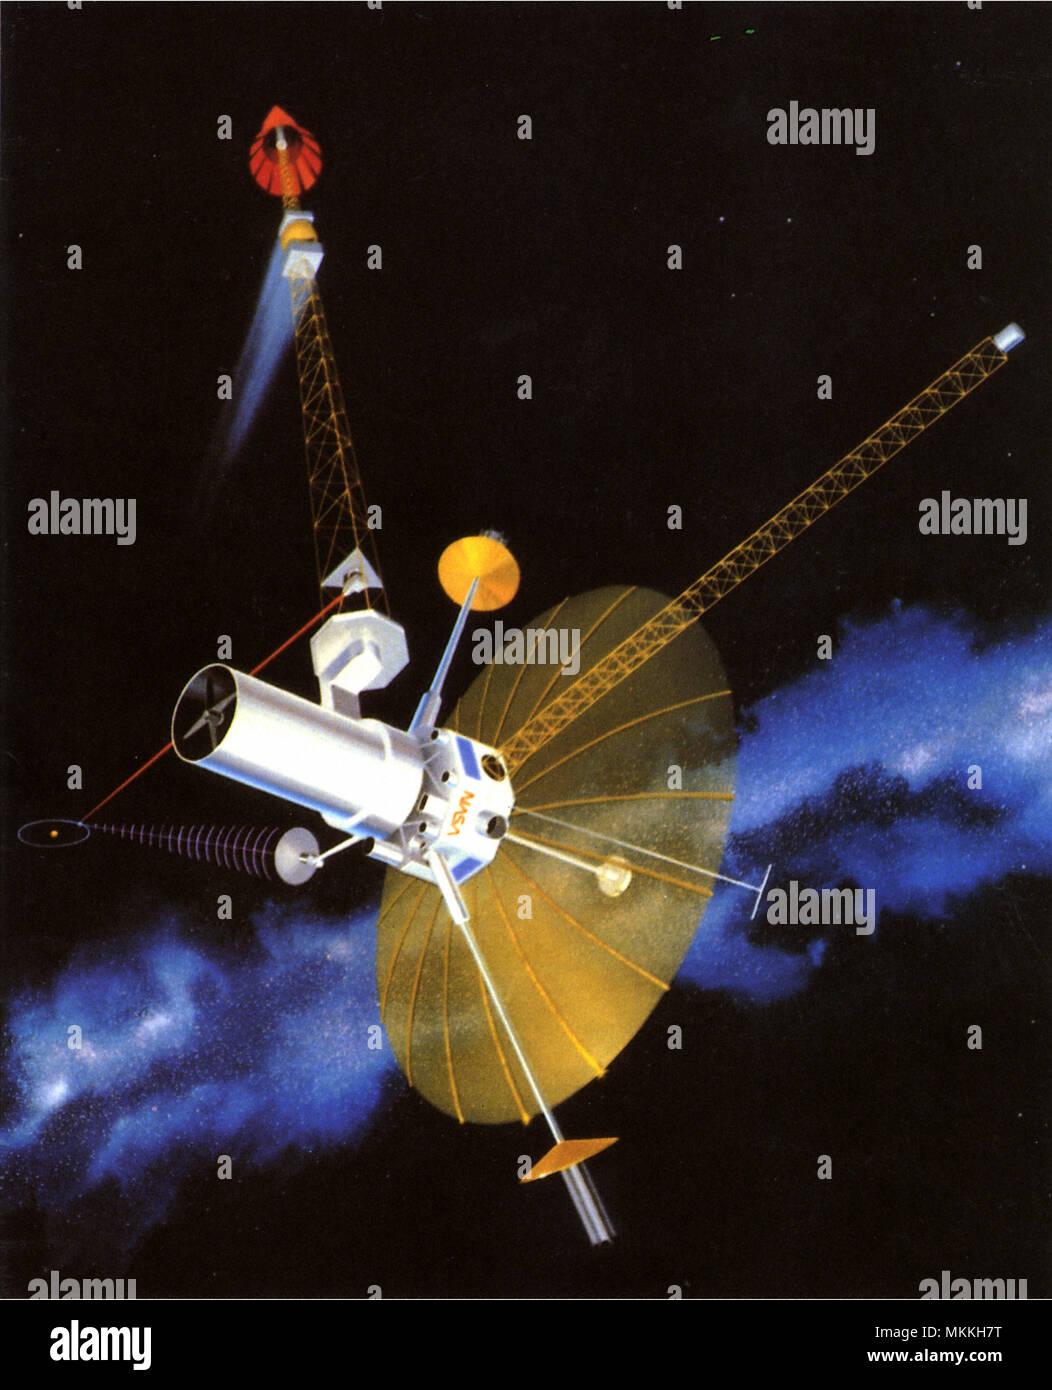 Interstellar System - Stock Image